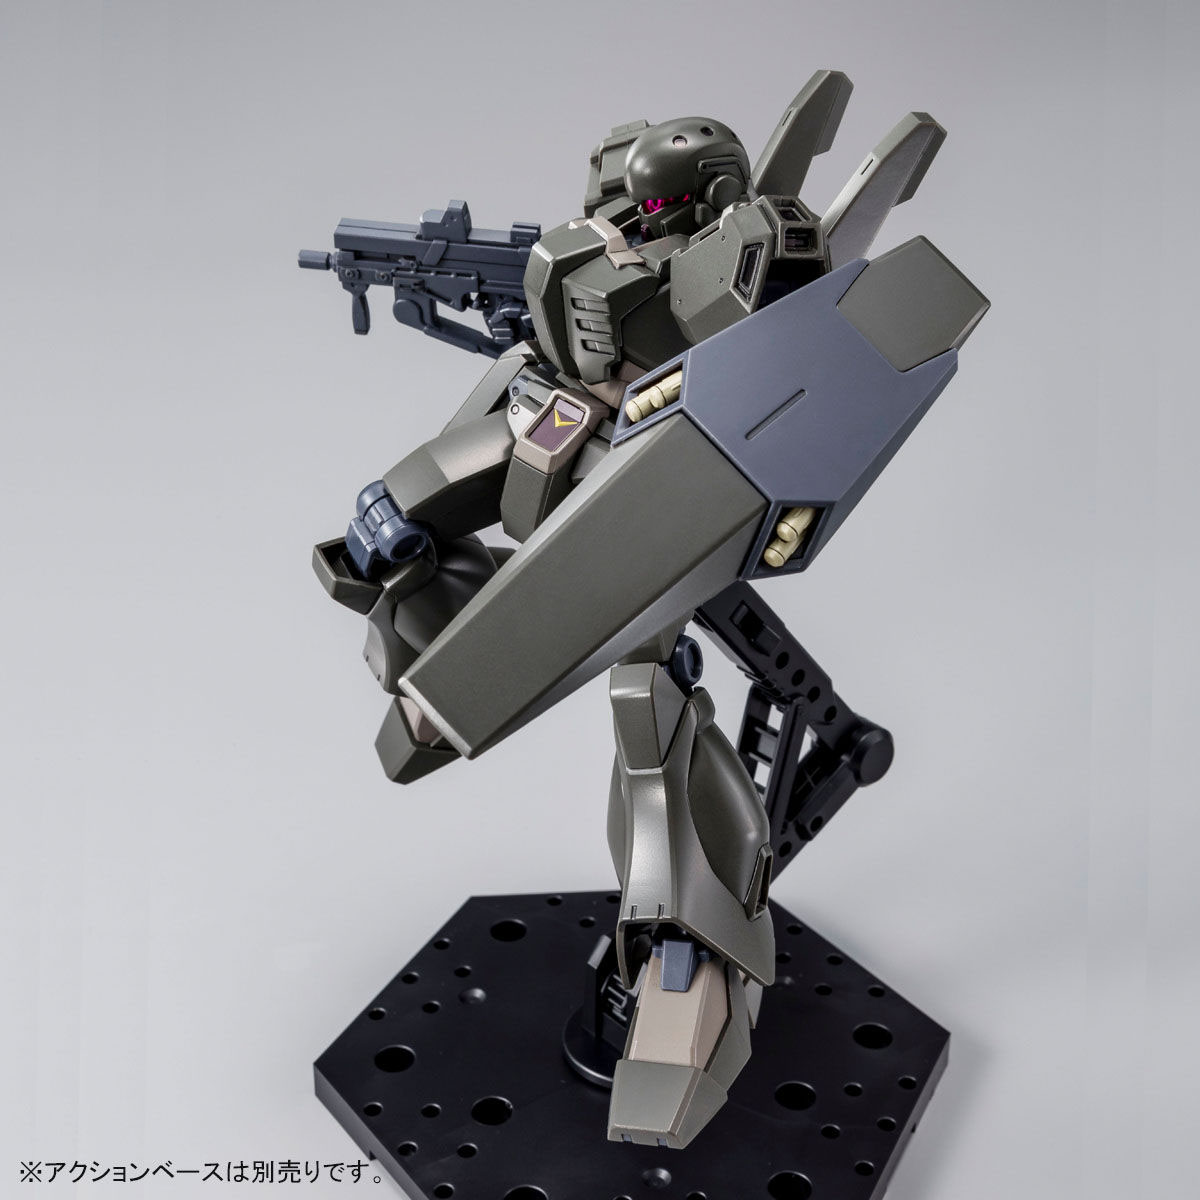 HG 1/144『ジェガンD型 (護衛隊仕様)』機動戦士ガンダムNT プラモデル-006